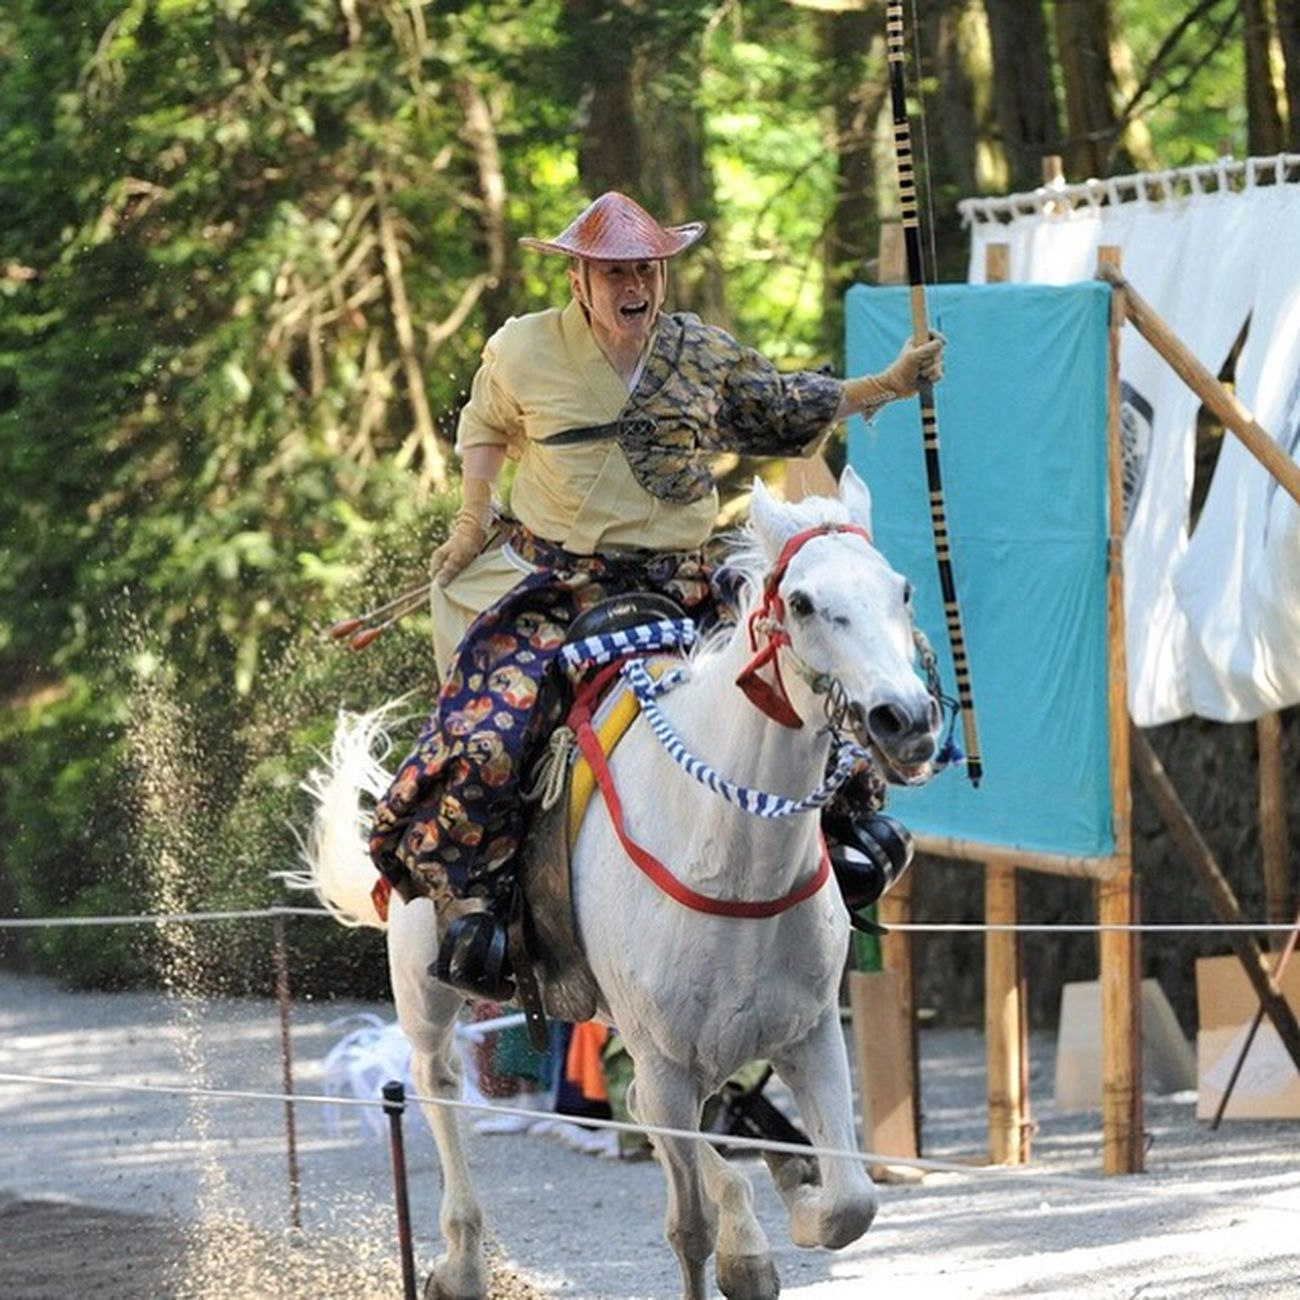 Yabusame Tochigi Nikko Toshogu Shrine Martialarts Japanese Festival Cool Japan Tradition